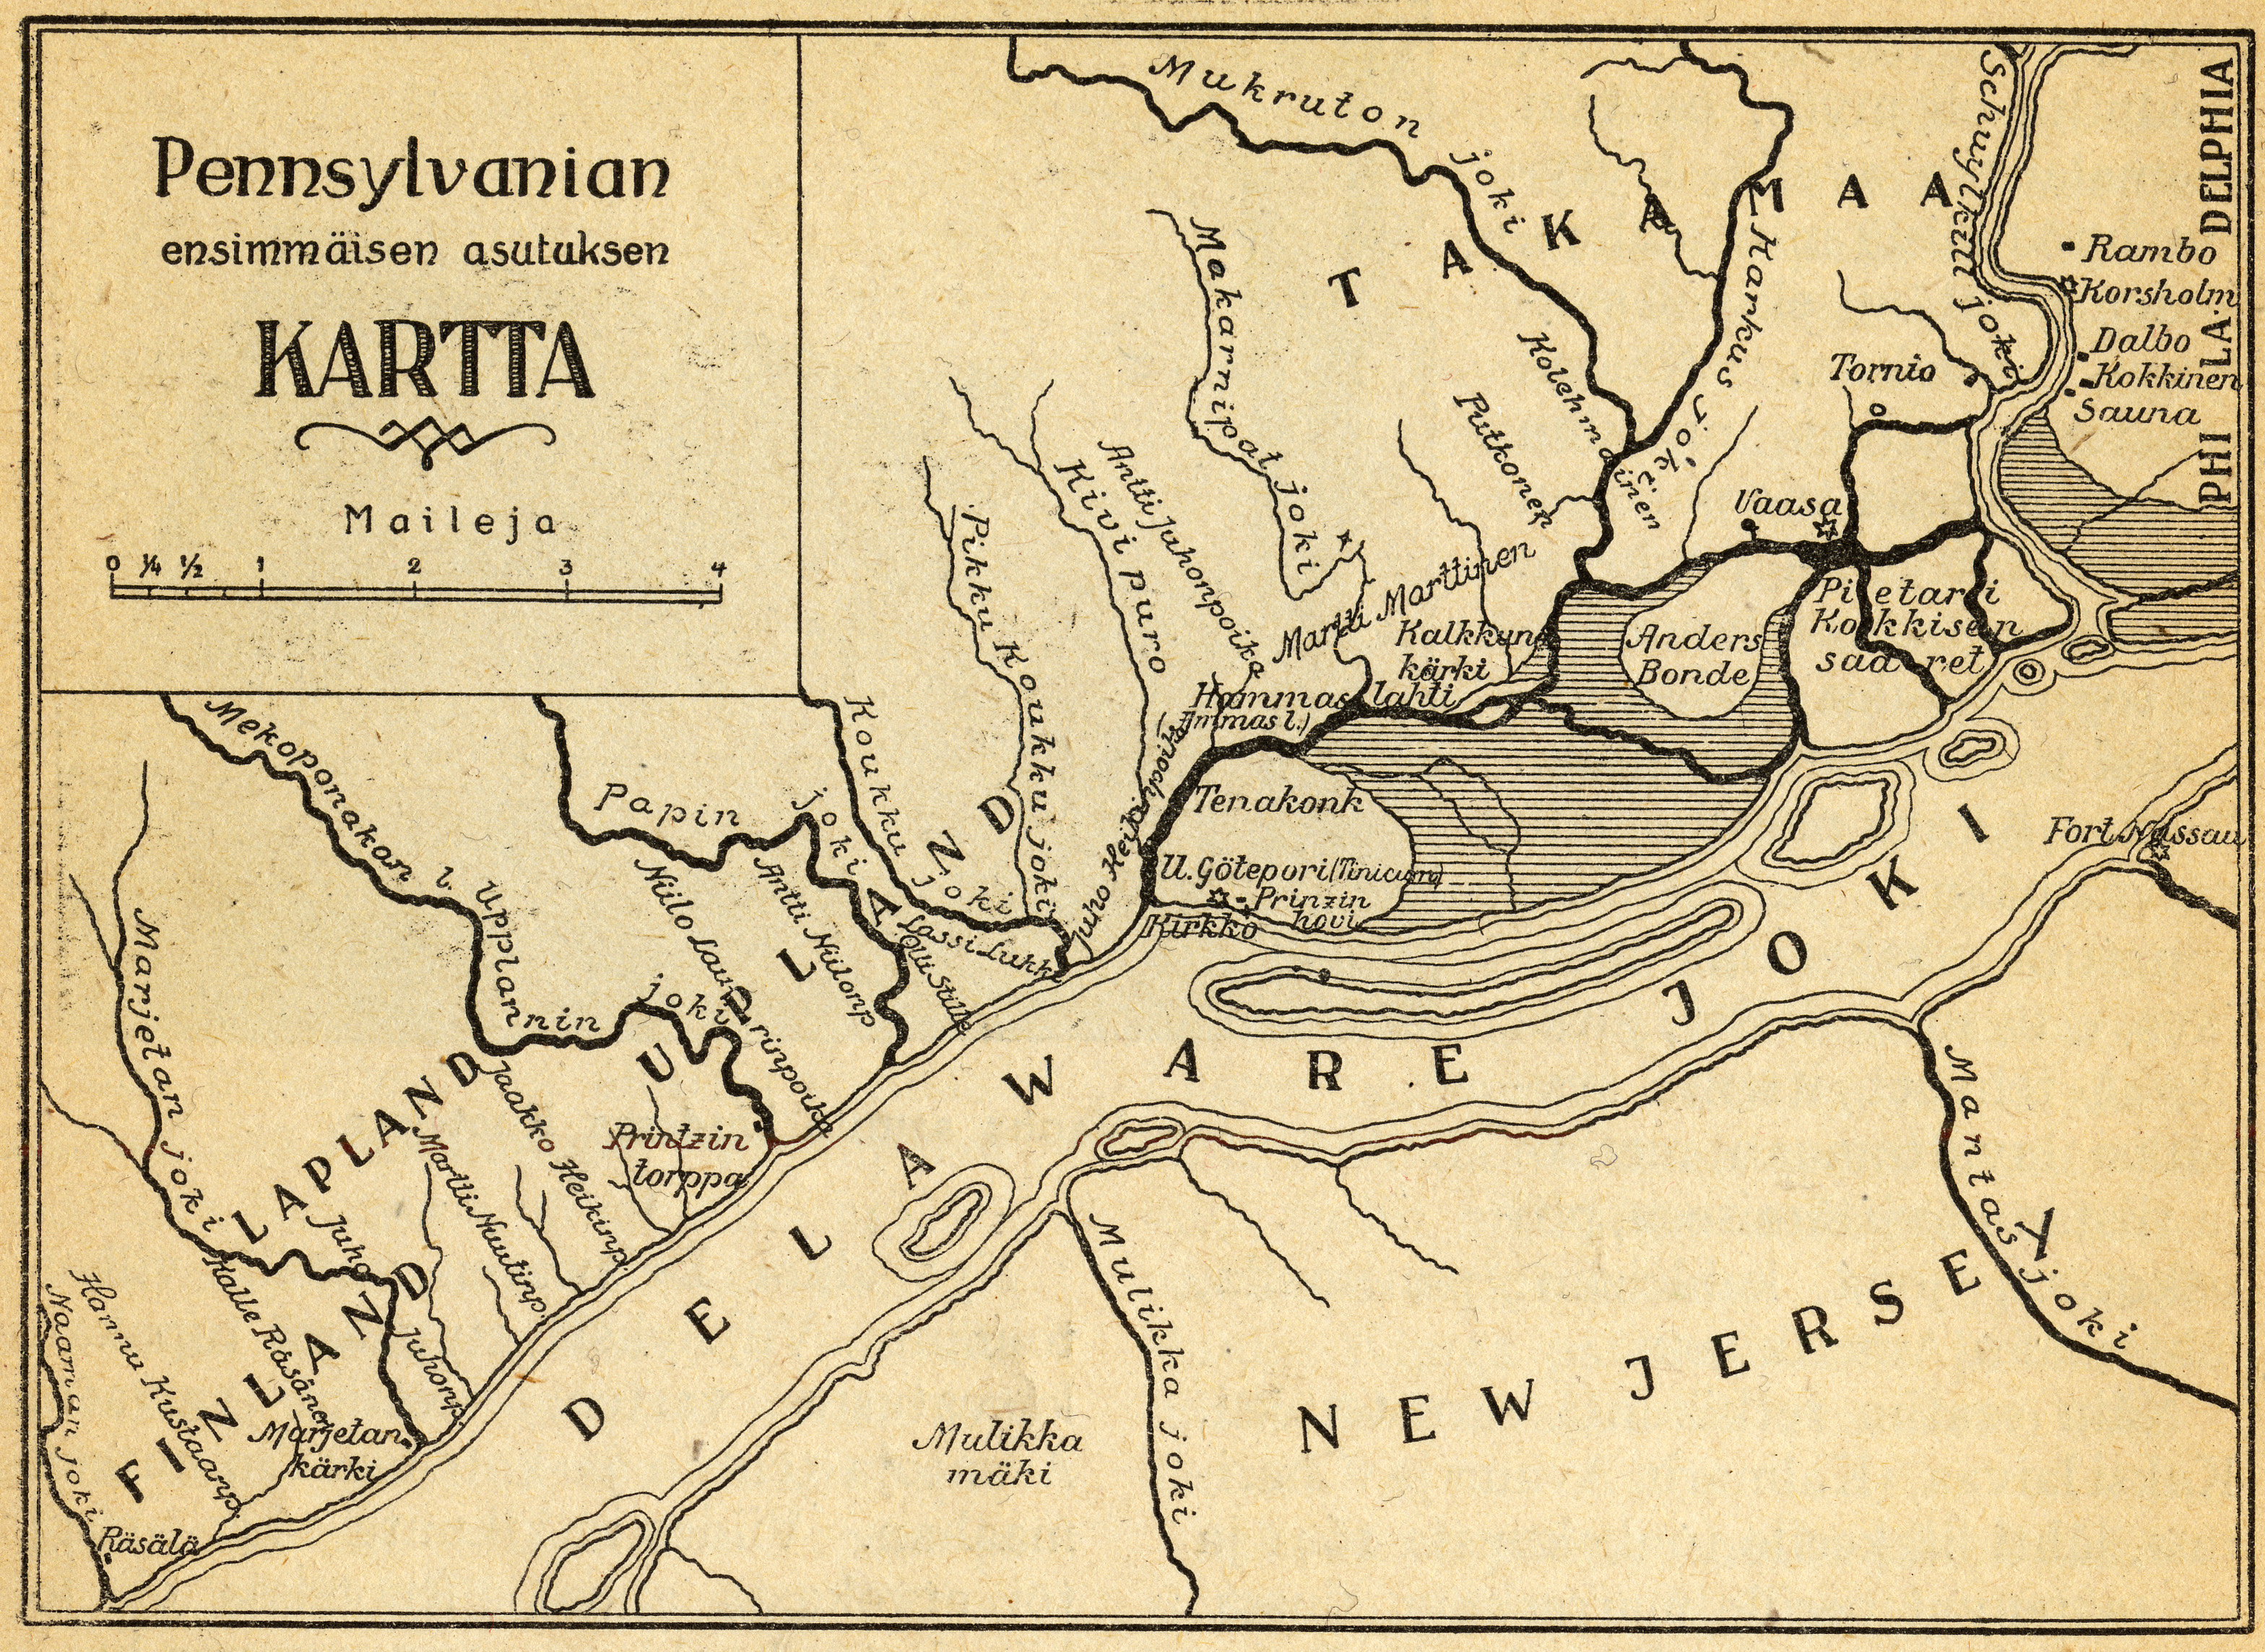 http://upload.wikimedia.org/wikipedia/commons/5/51/Pennsylvania_First_colonization_map.jpg